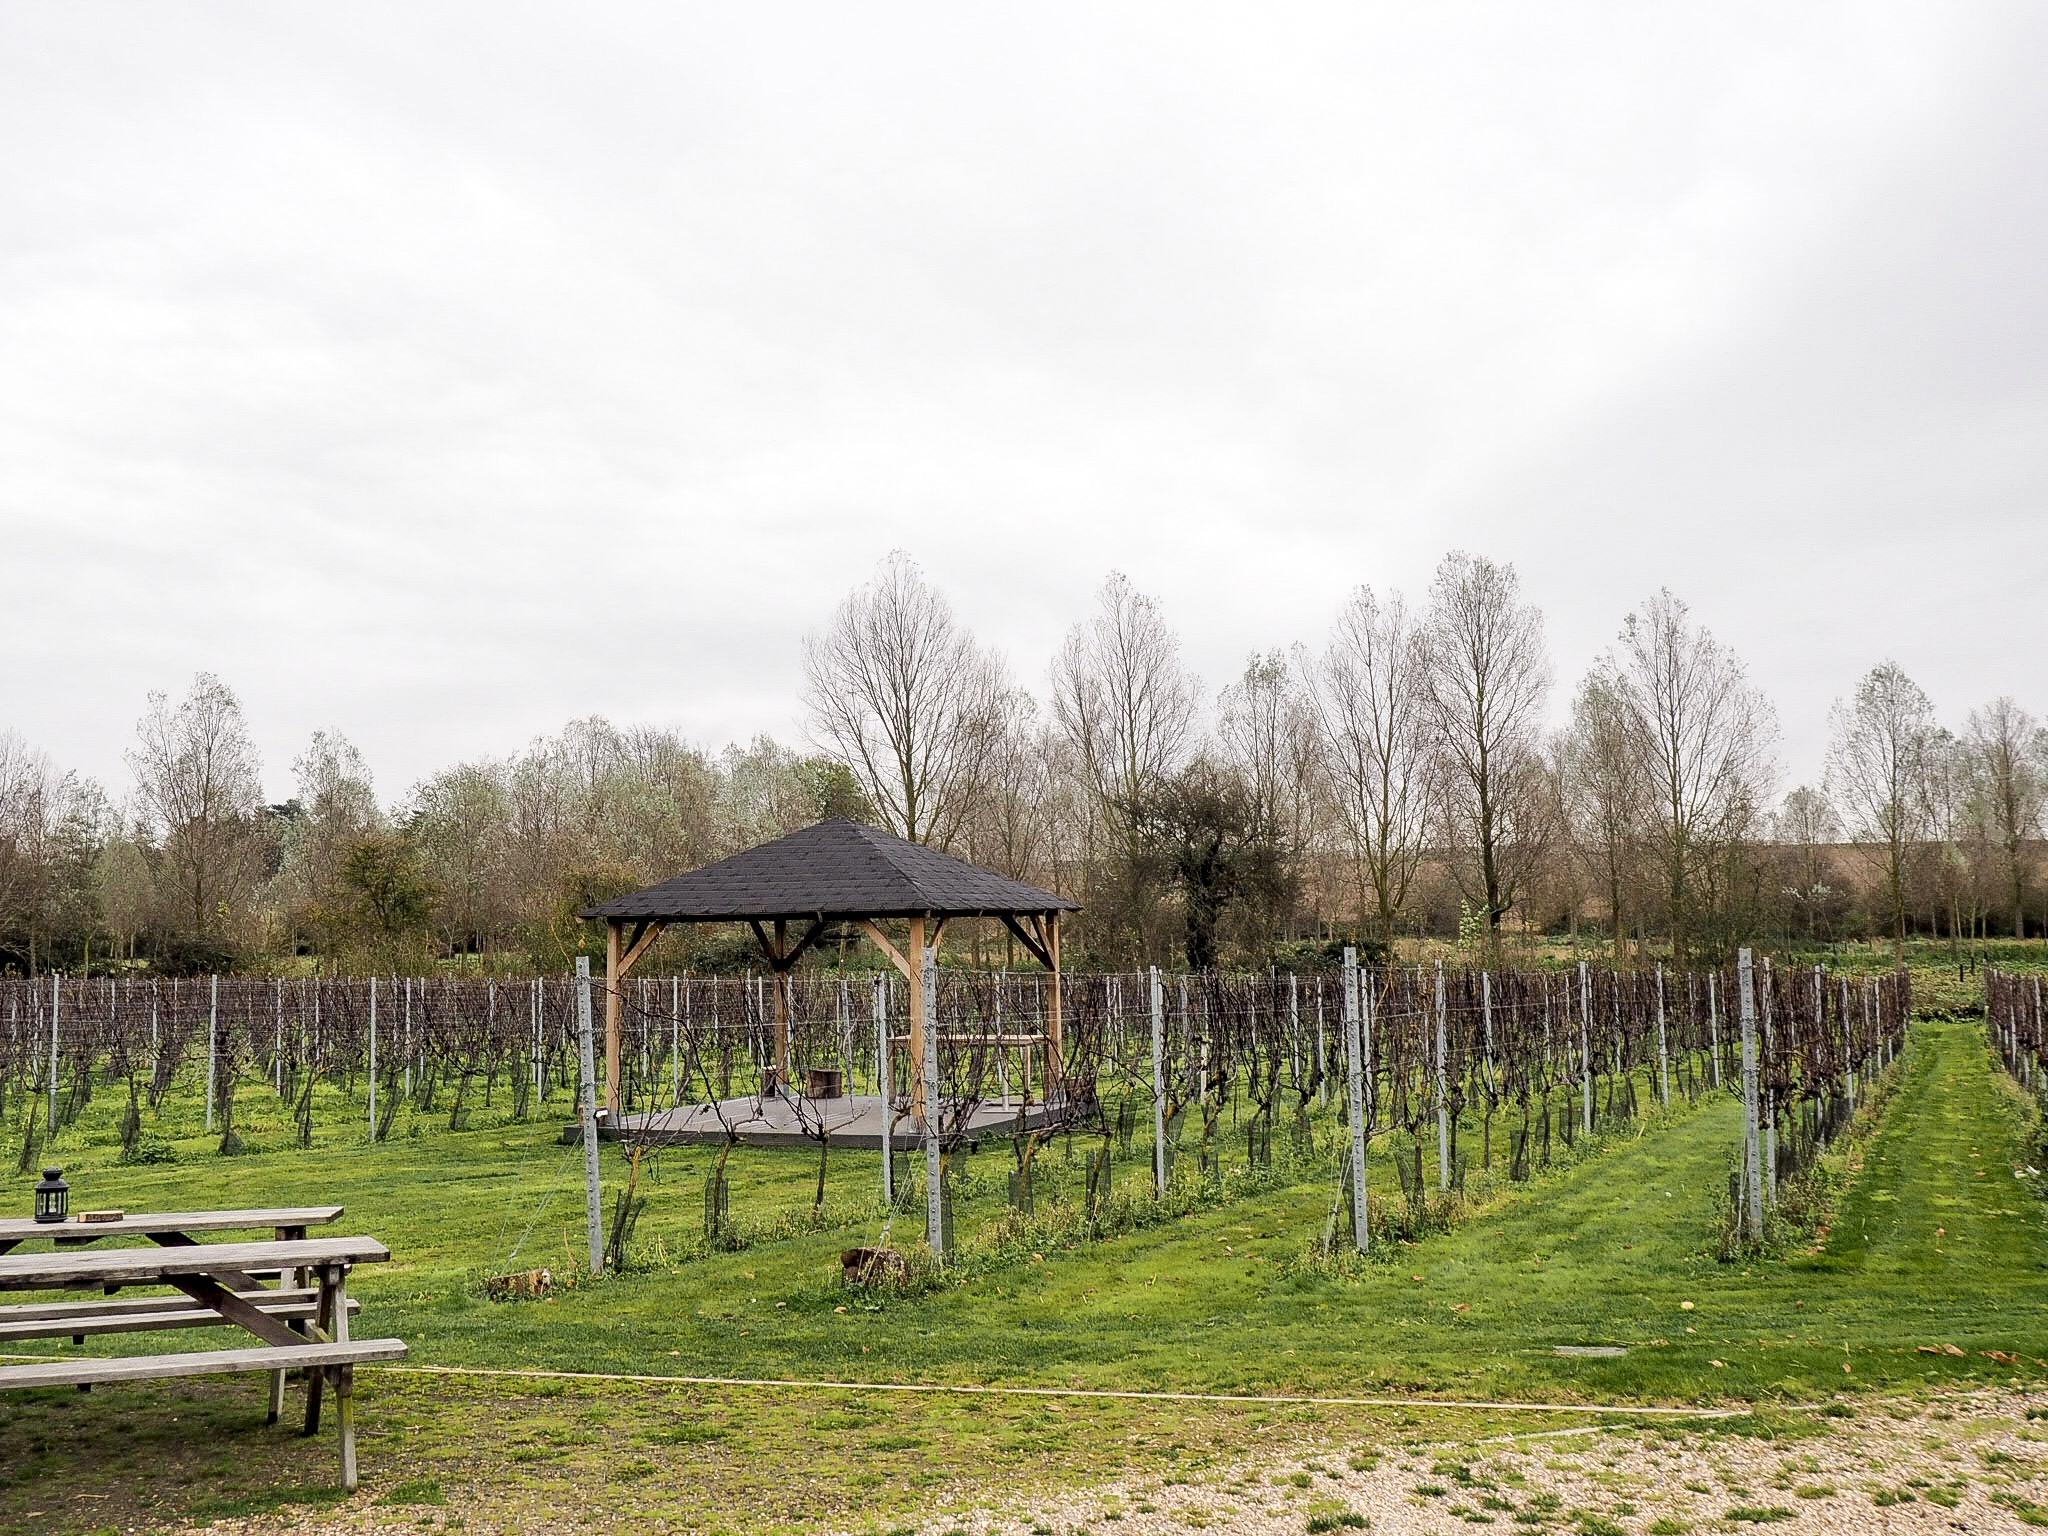 West Street Vineyards